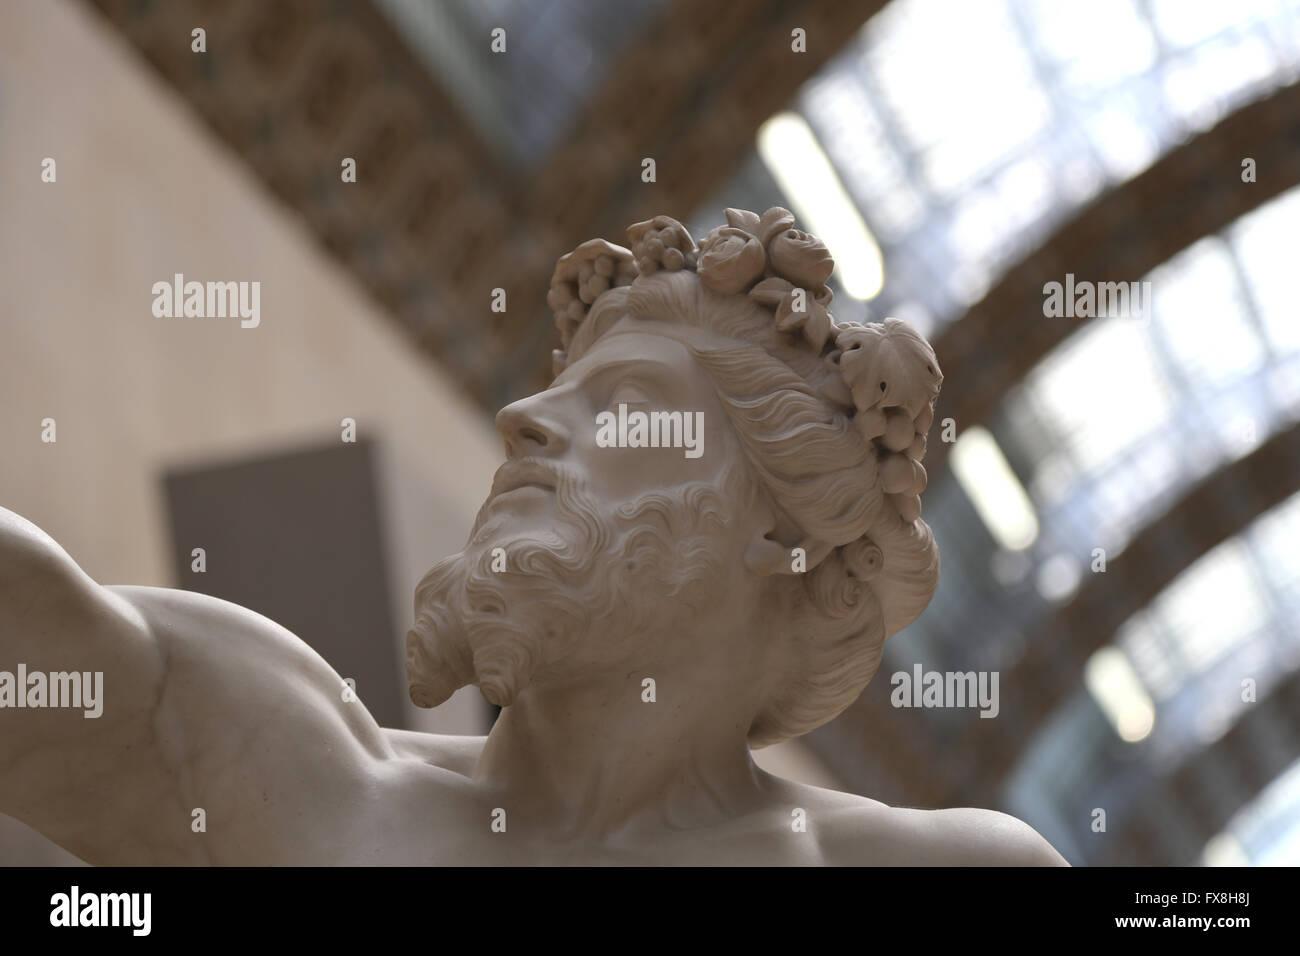 Anacreon (582-485). Greek lyric poet. Statue, 1851 by Eugene Guillaume (1822-1905). Orsay Museum. Paris. France. - Stock Image